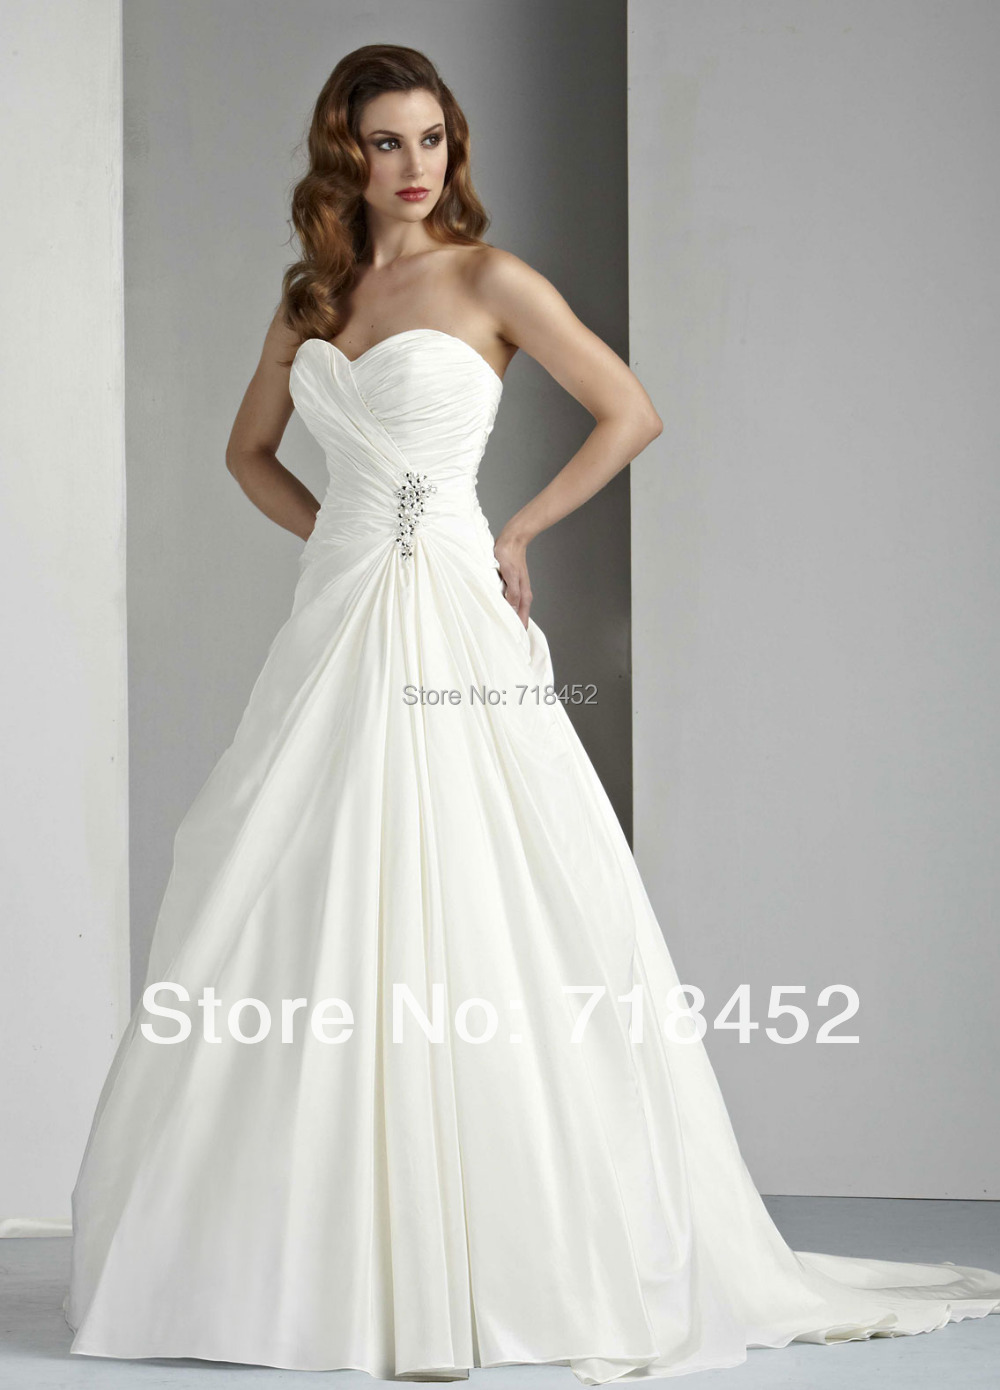 2014 mature bride wedding dresses a line bridal gown cheap price vestido de noiva taffeta sweetheart